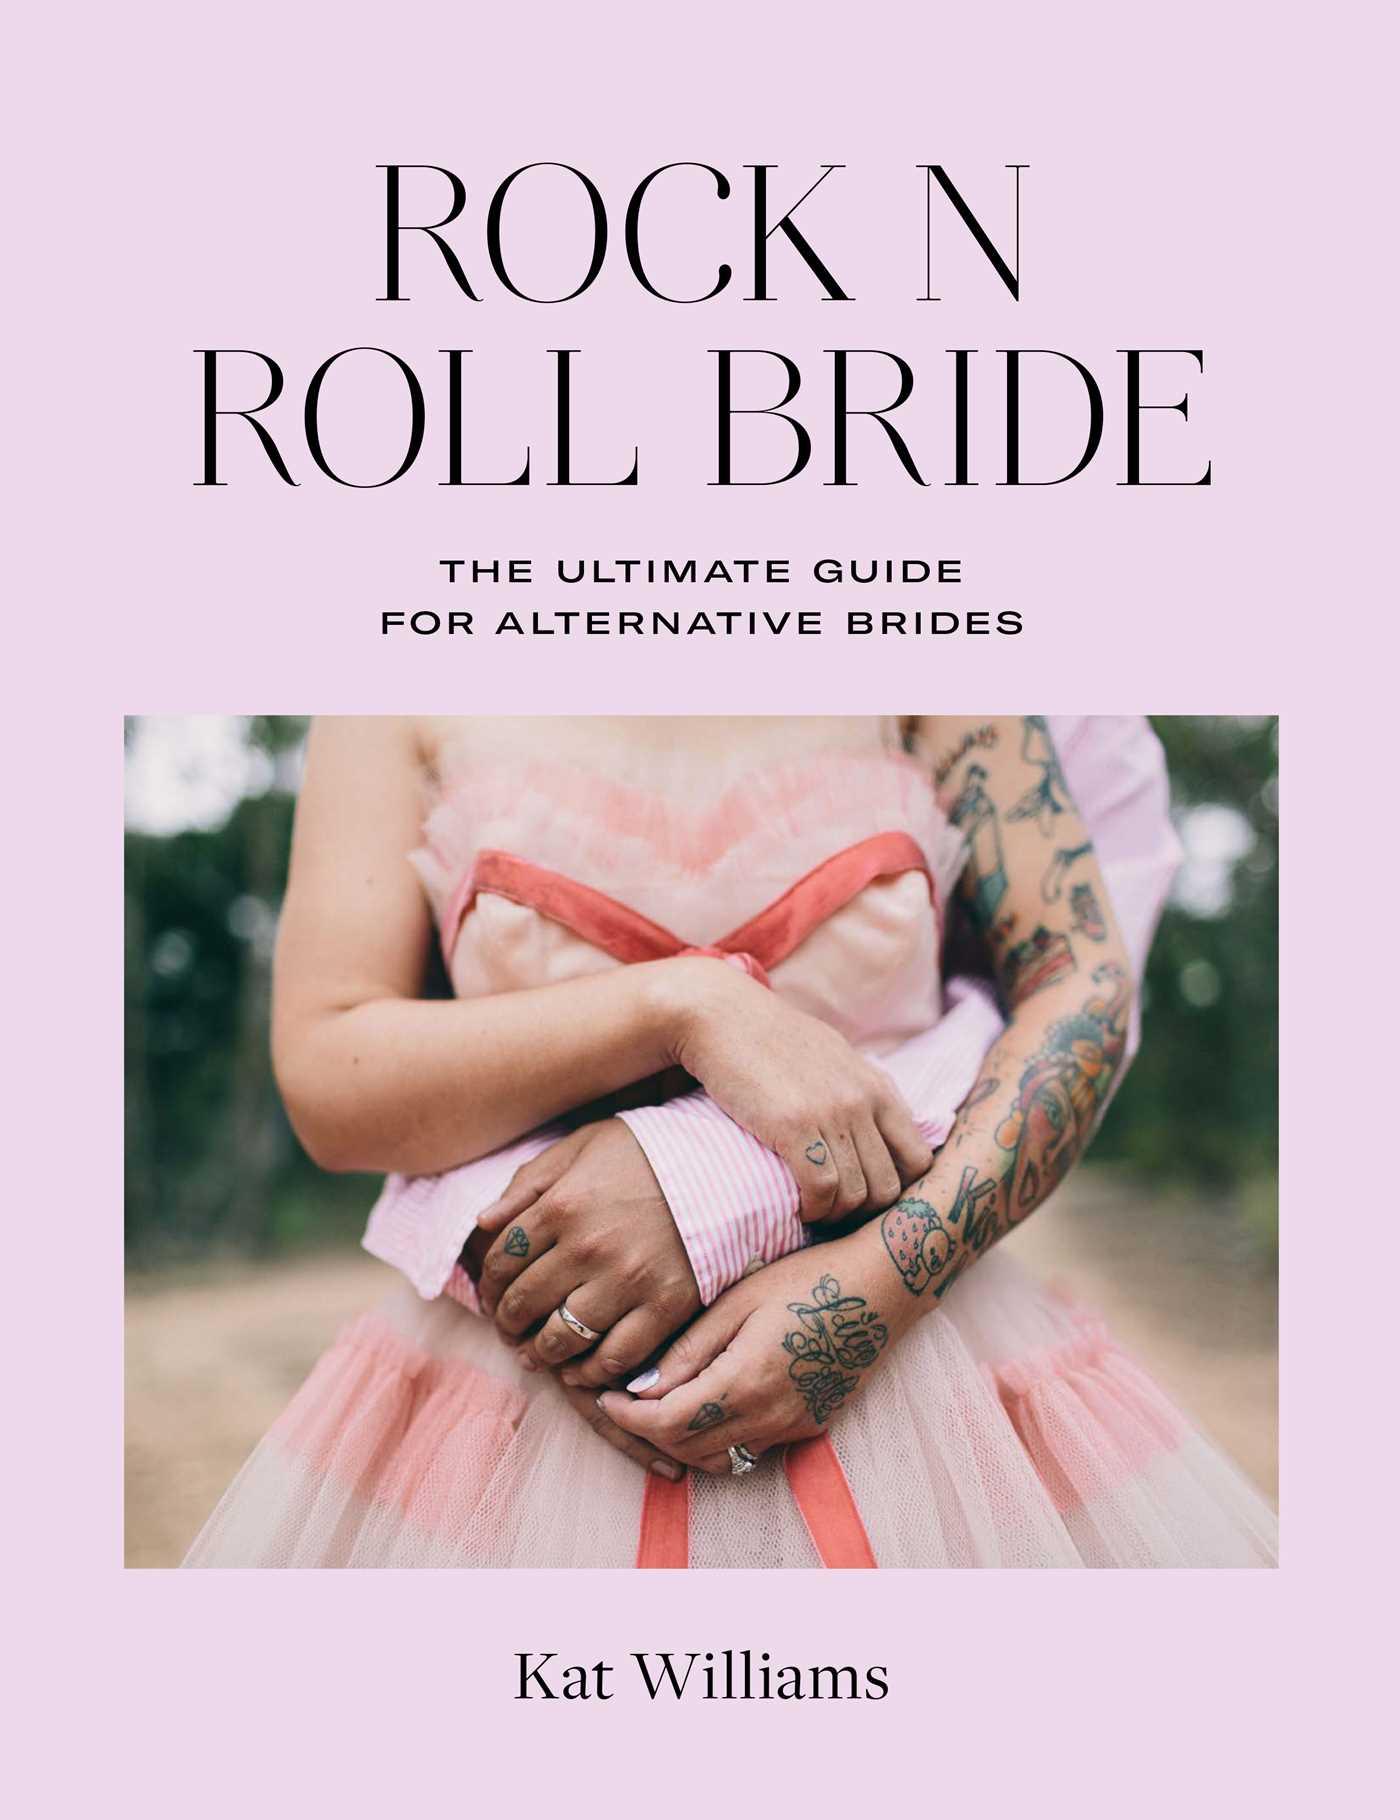 Rock n roll bride 9781788790659 hr